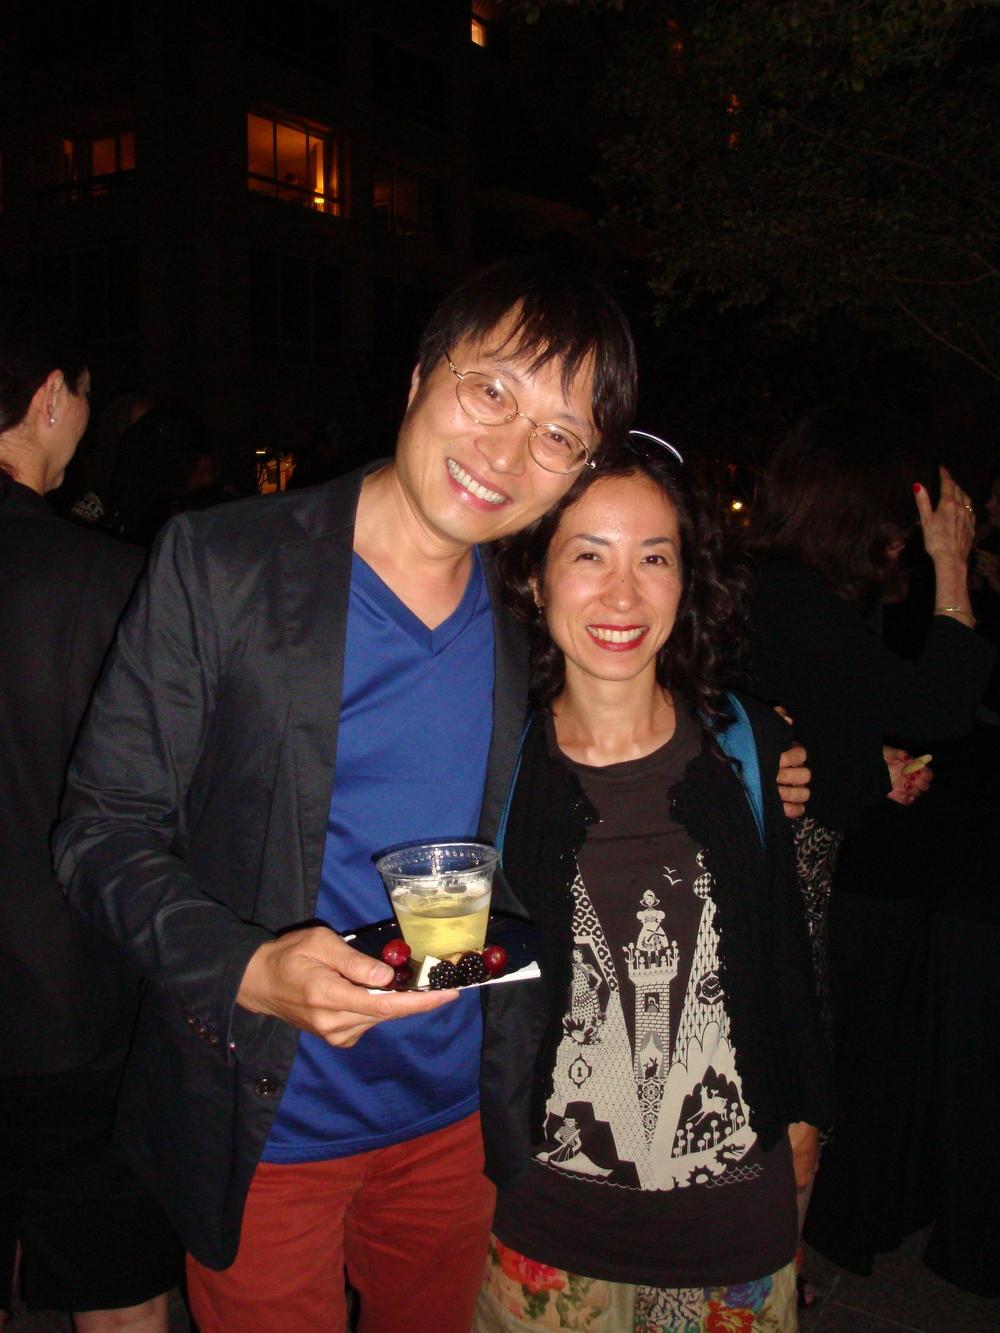 Lei Liang and Ayano Kataoka